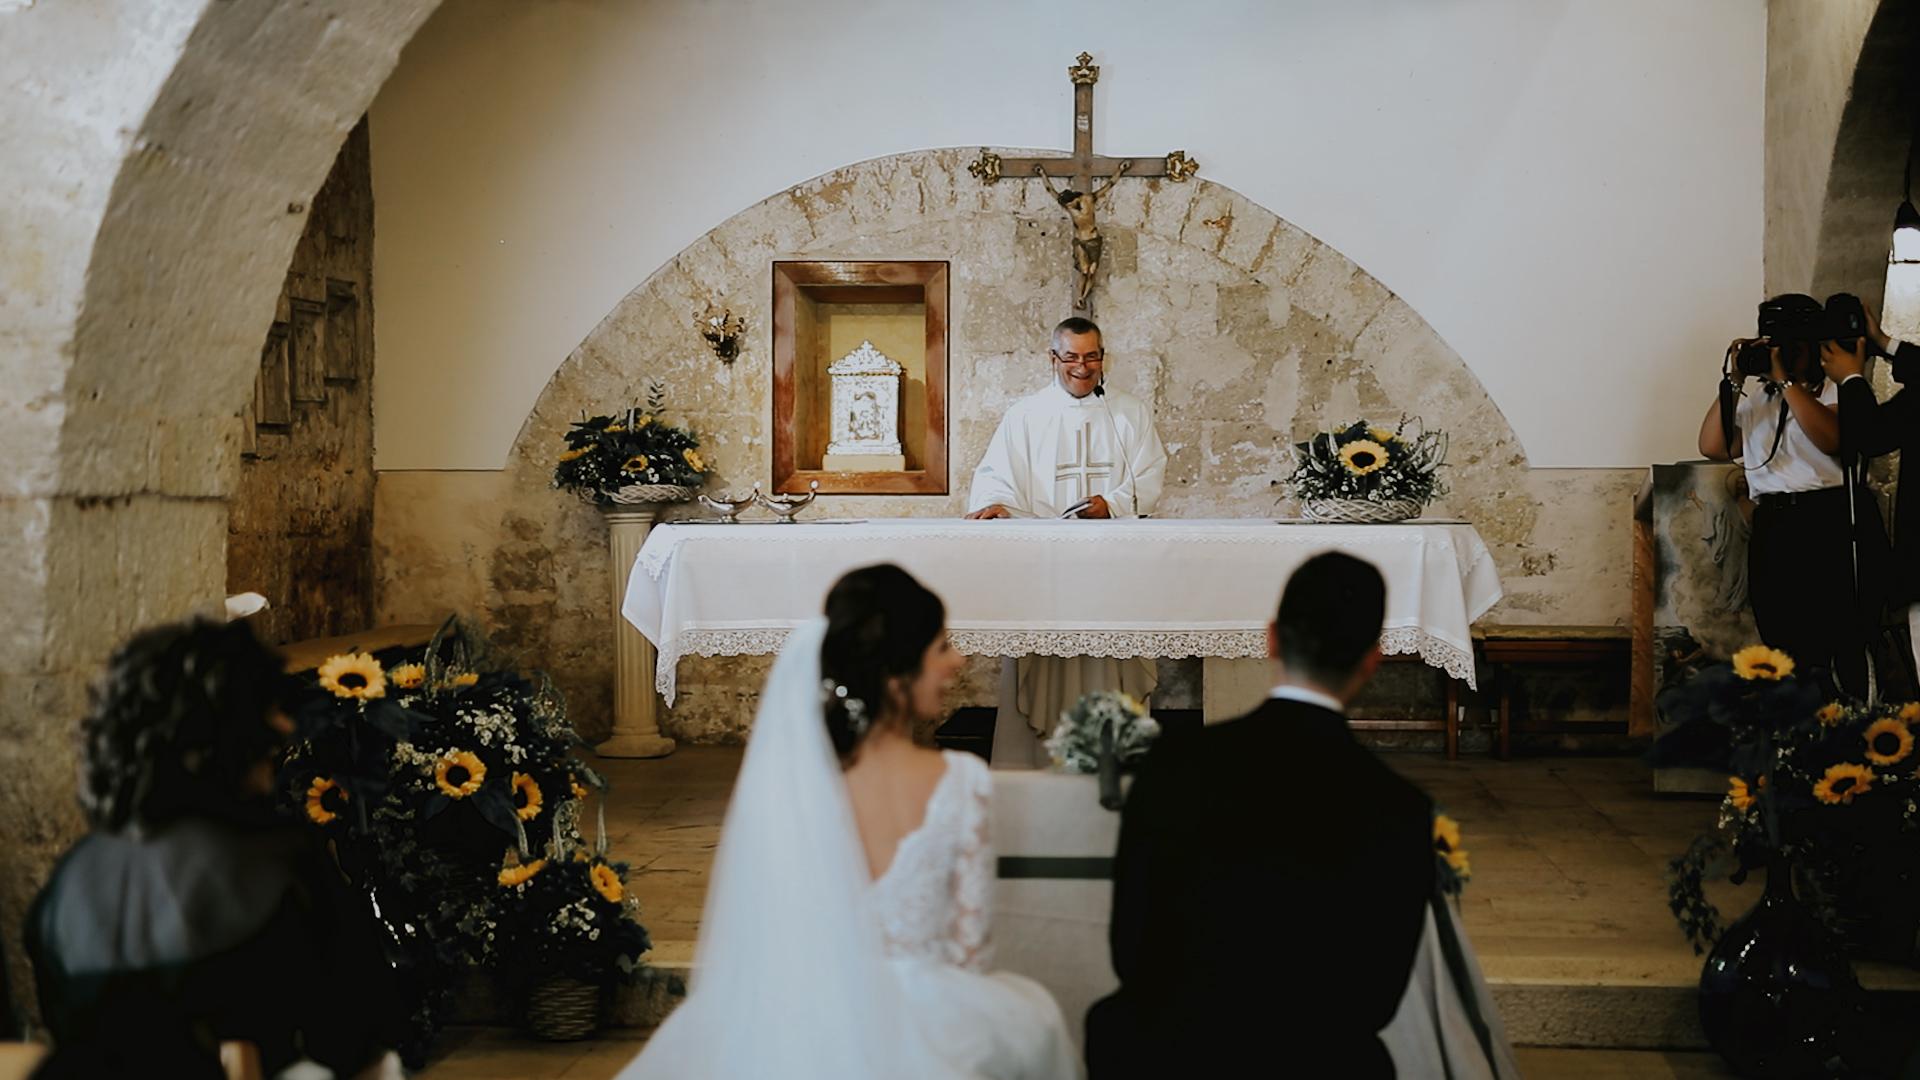 Tenuta-Pinto-Mola-di-Bari-Matrimonio Matrimonio a Tenuta Pinto